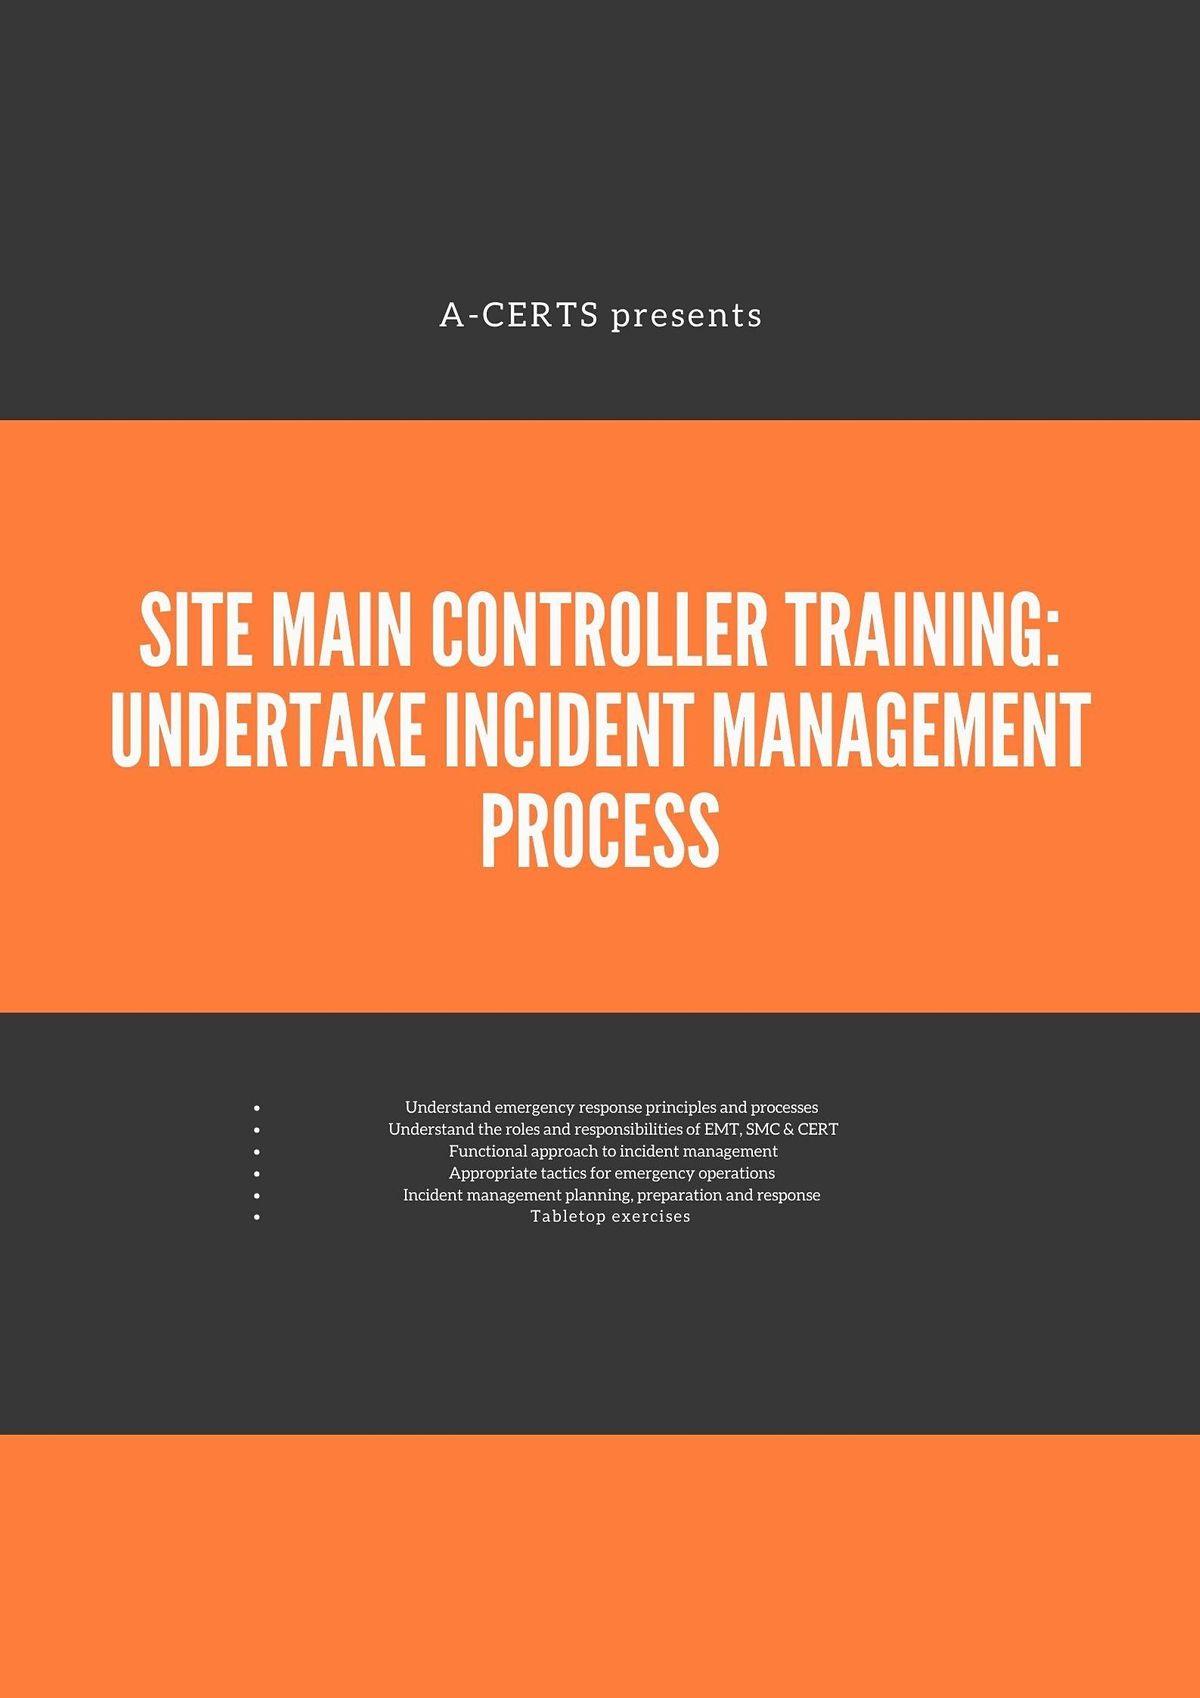 SMC Training: Undertake Incident Management Process (1 Day) Run 42